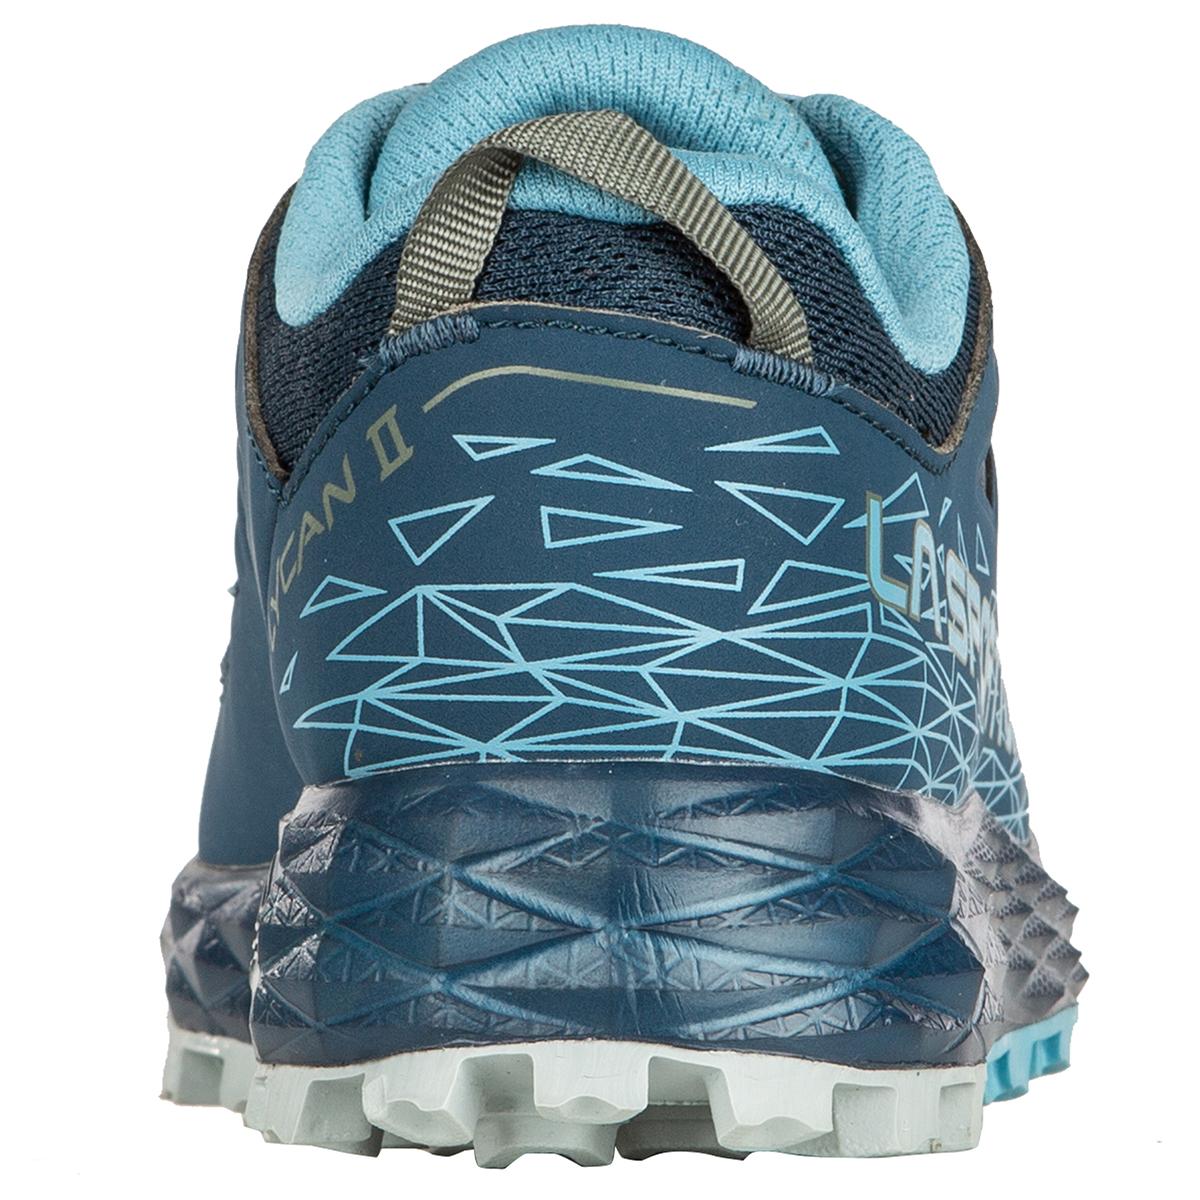 Women's La Sportiva Lycan II Trail Running Shoe - Color: Opal/Pacific Blue - Size: 6.5 - Width: Regular, Opal/Pacific Blue, large, image 4